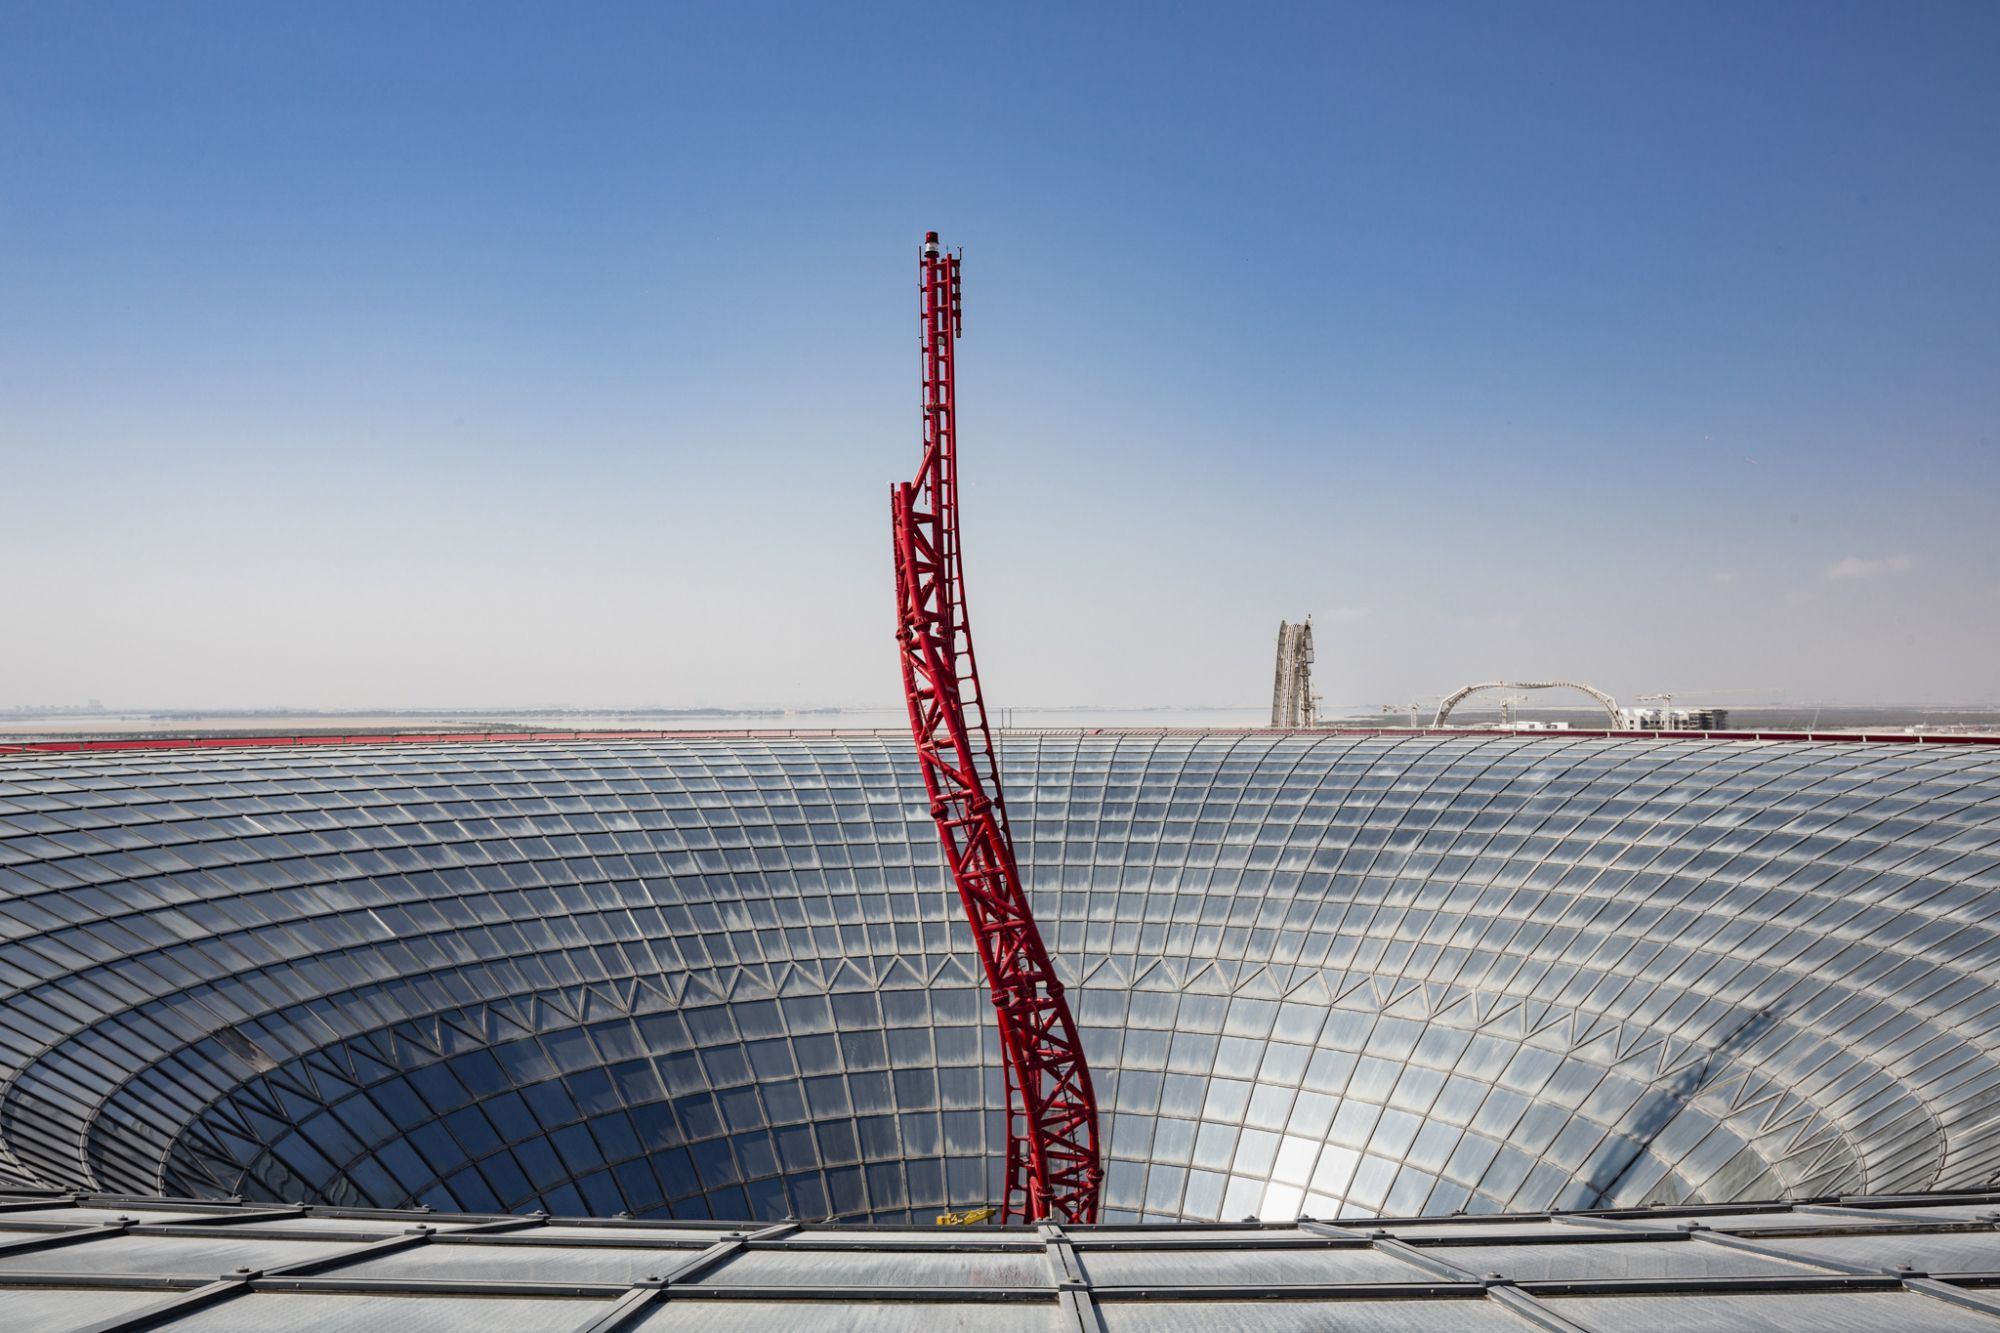 Ferrari World Abu Dhabi Officially Opens Its Latest